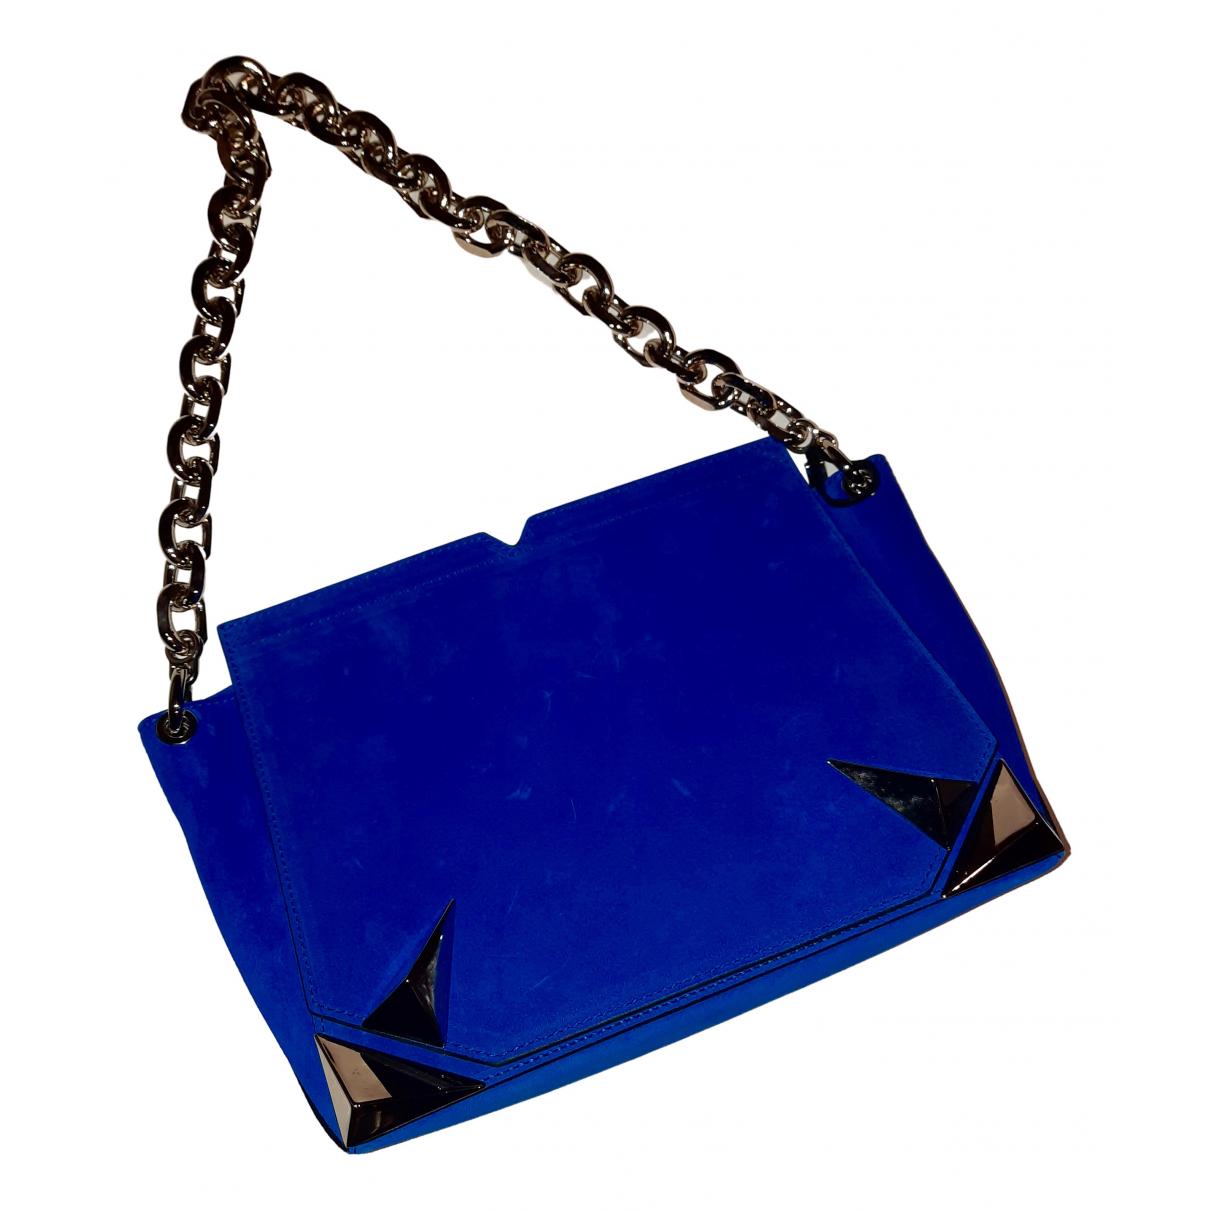 Mugler N Blue Suede handbag for Women N